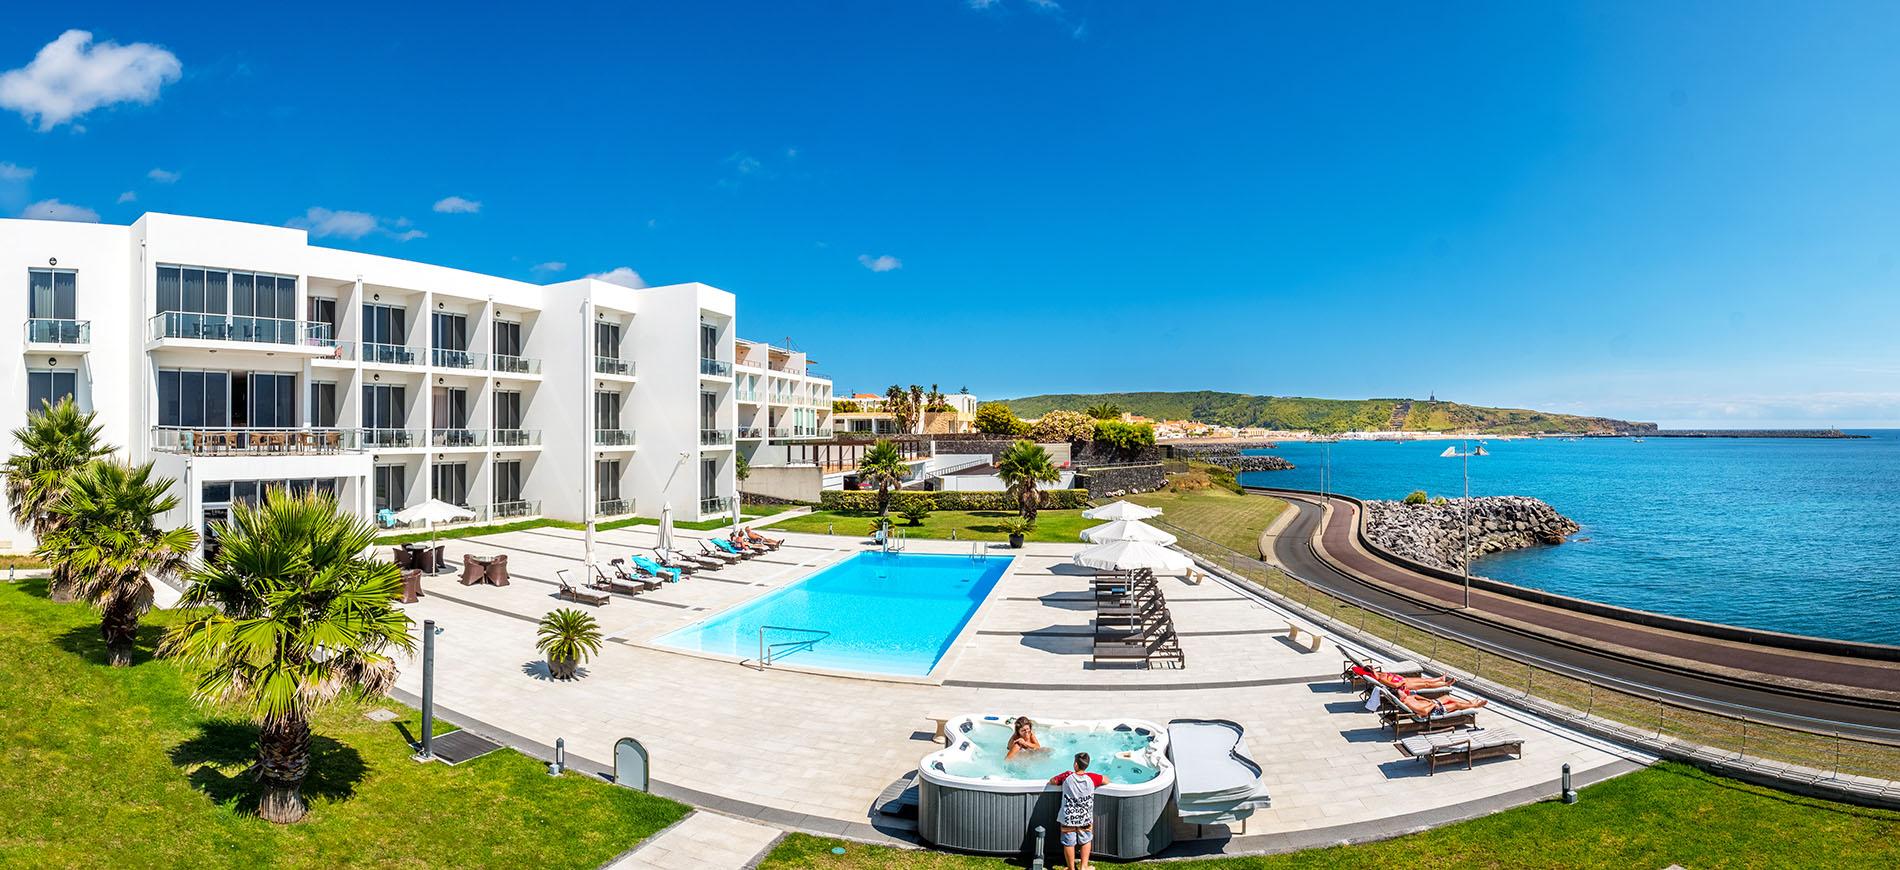 Hotel Atlantida Mar Azores Açores Ilha Terceira Praia Vitória Traseira Piscina Jacuzzi Oceano Serra